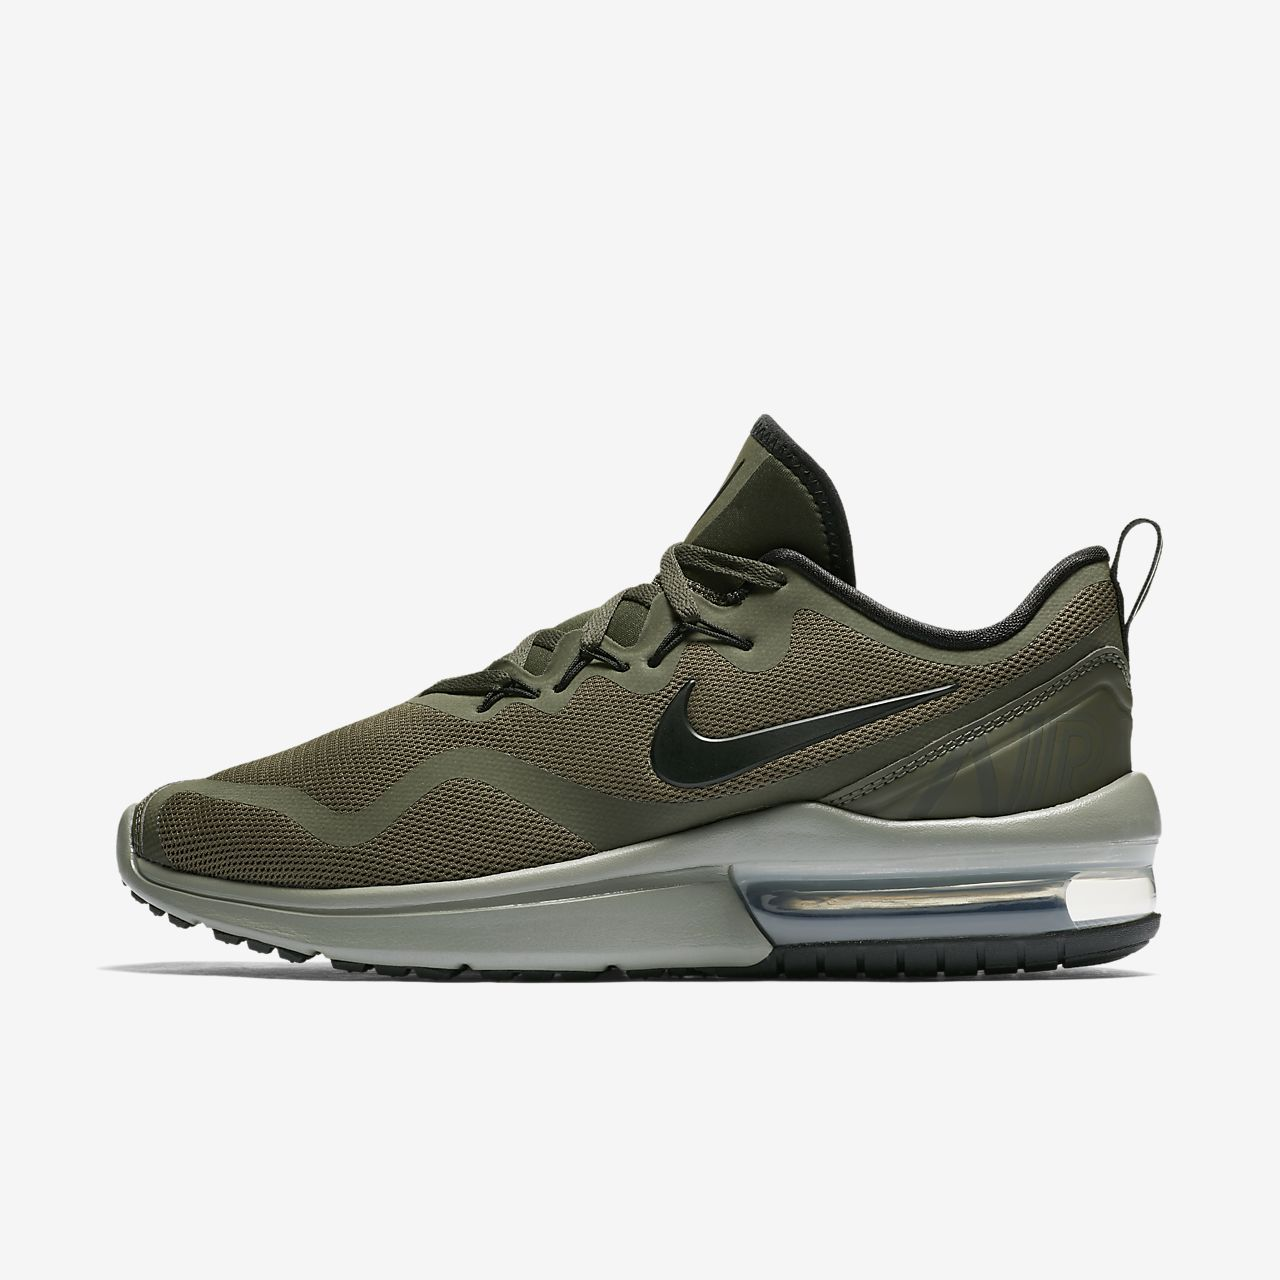 ... Chaussure de running Nike Air Max Fury pour Homme